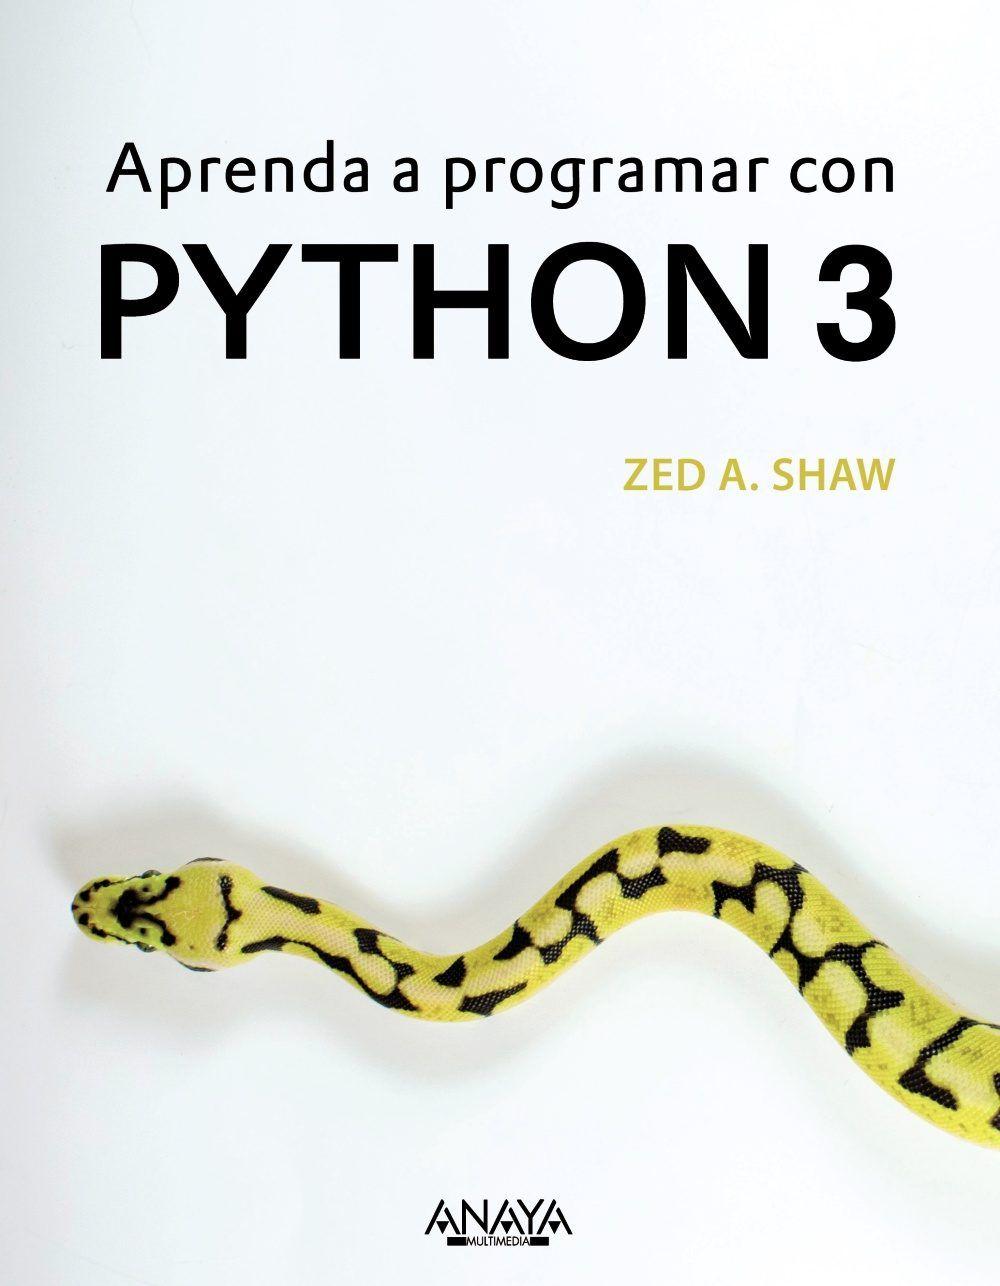 Aprenda a programar con Python 3 / Zed A. Shaw   Creation of ...